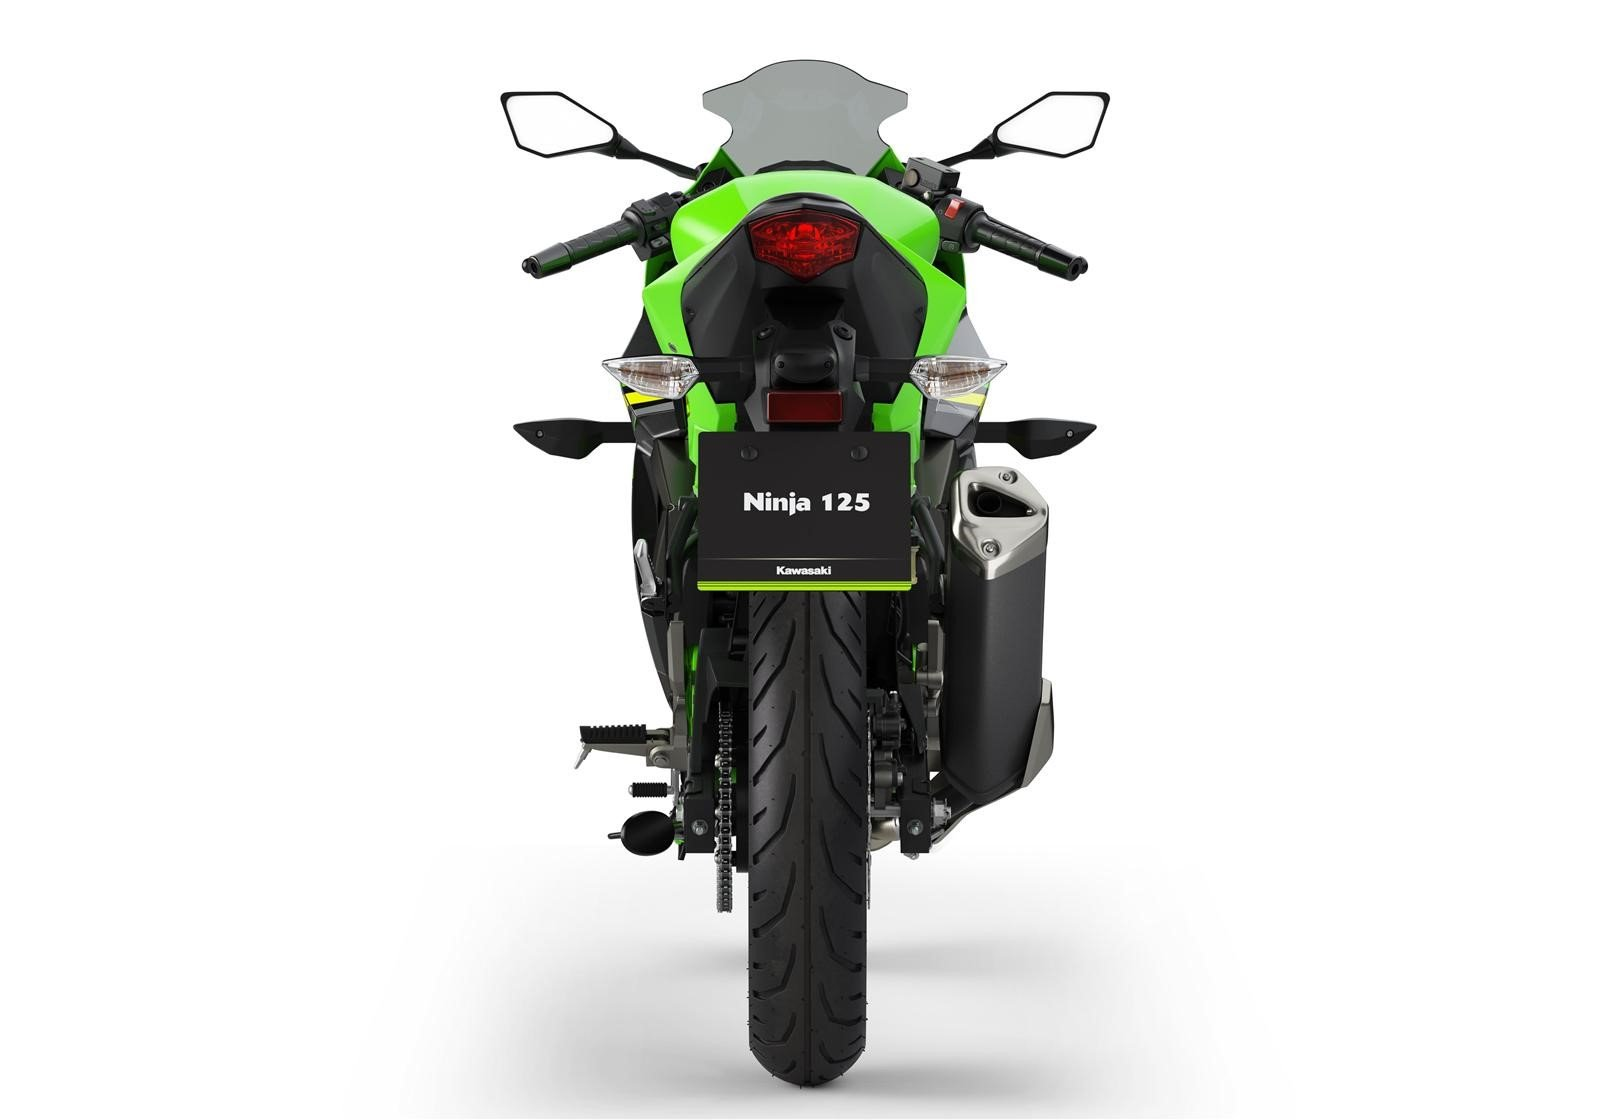 New 2019 Kawasaki Ninja 125 ABS KRT**SAVE £800!!** For Sale (picture 6 of 6)